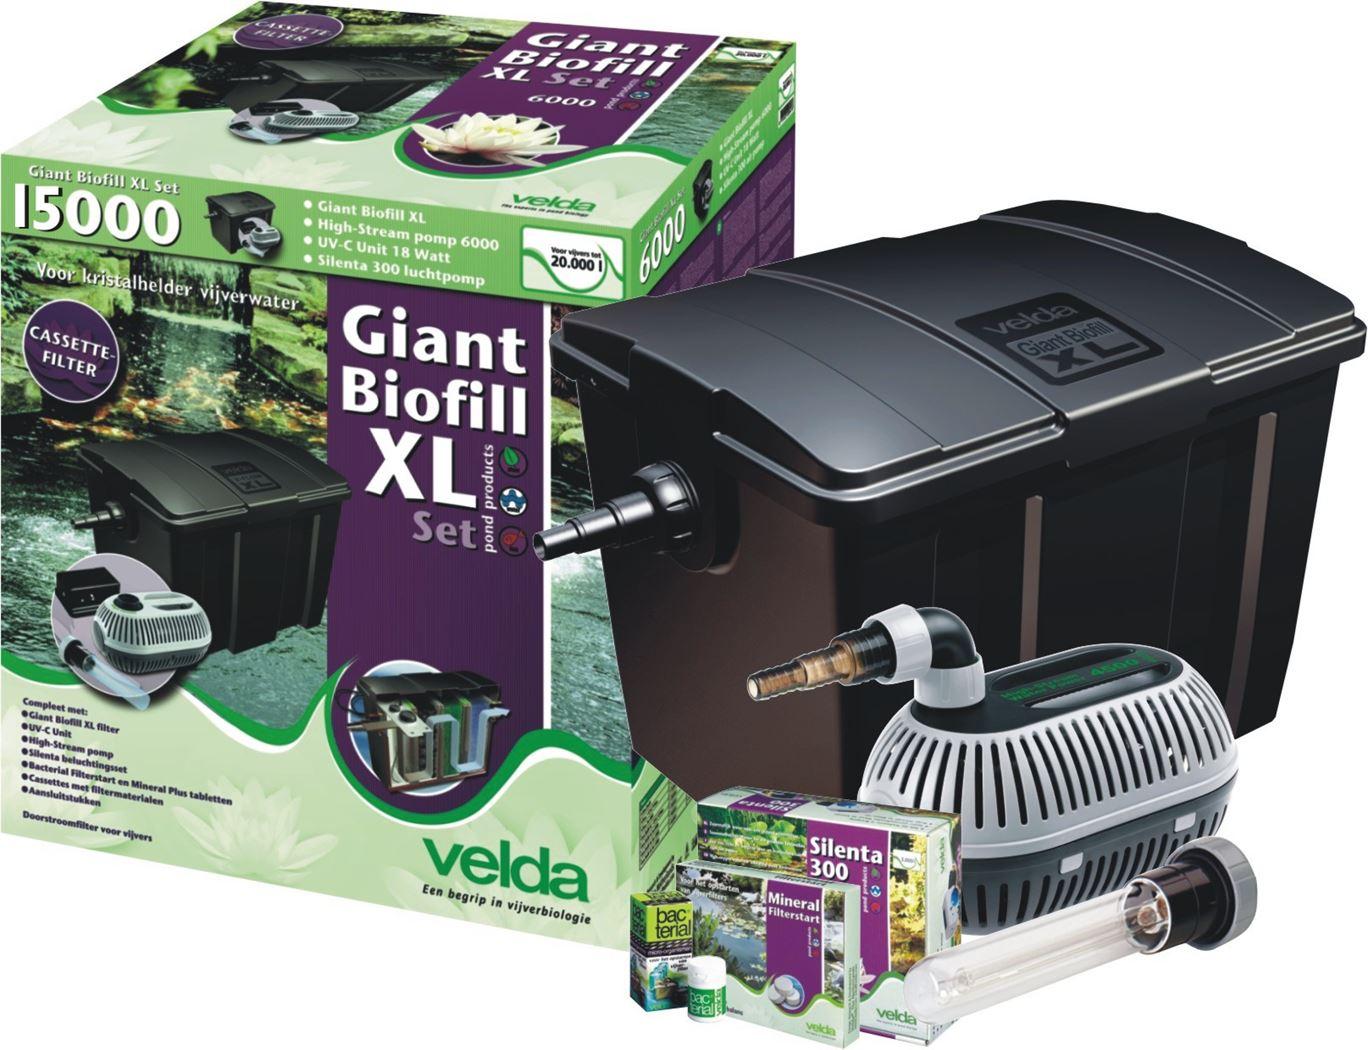 velda filter giant biofill xl set 60000